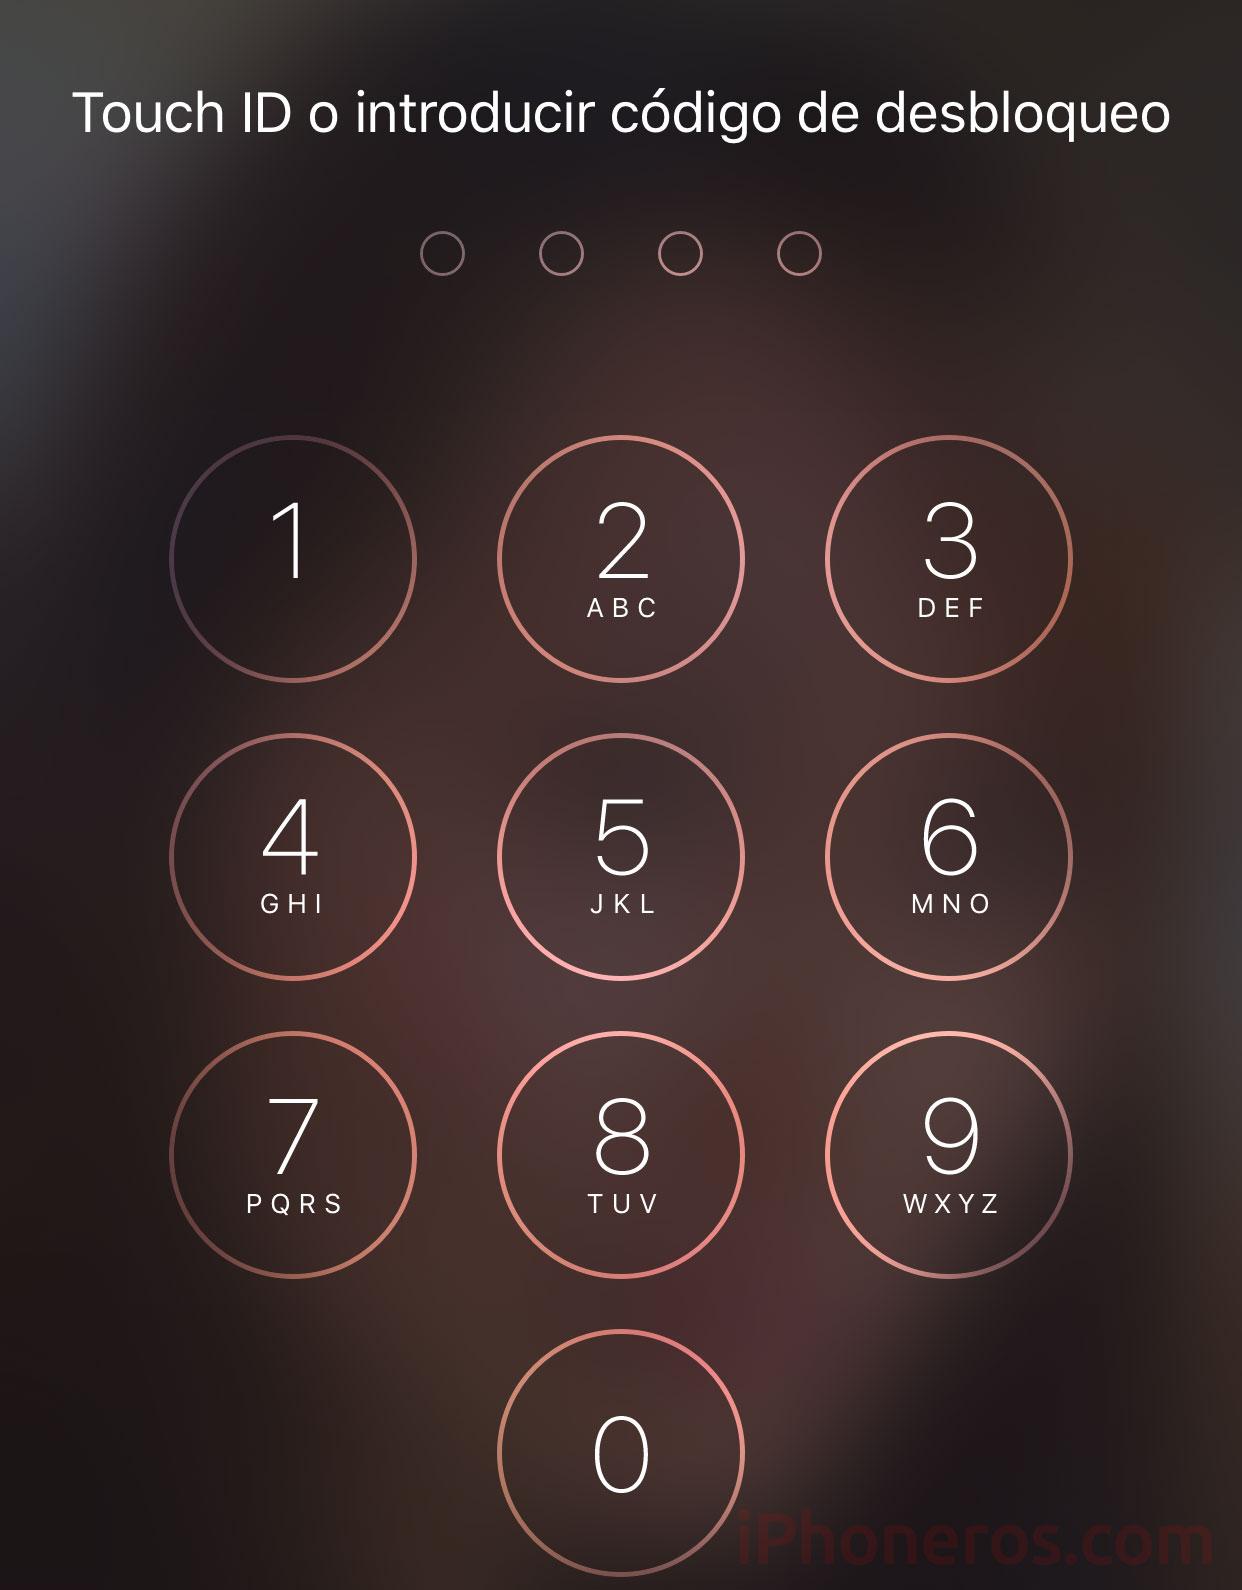 Clave de desbloqueo del iPhone